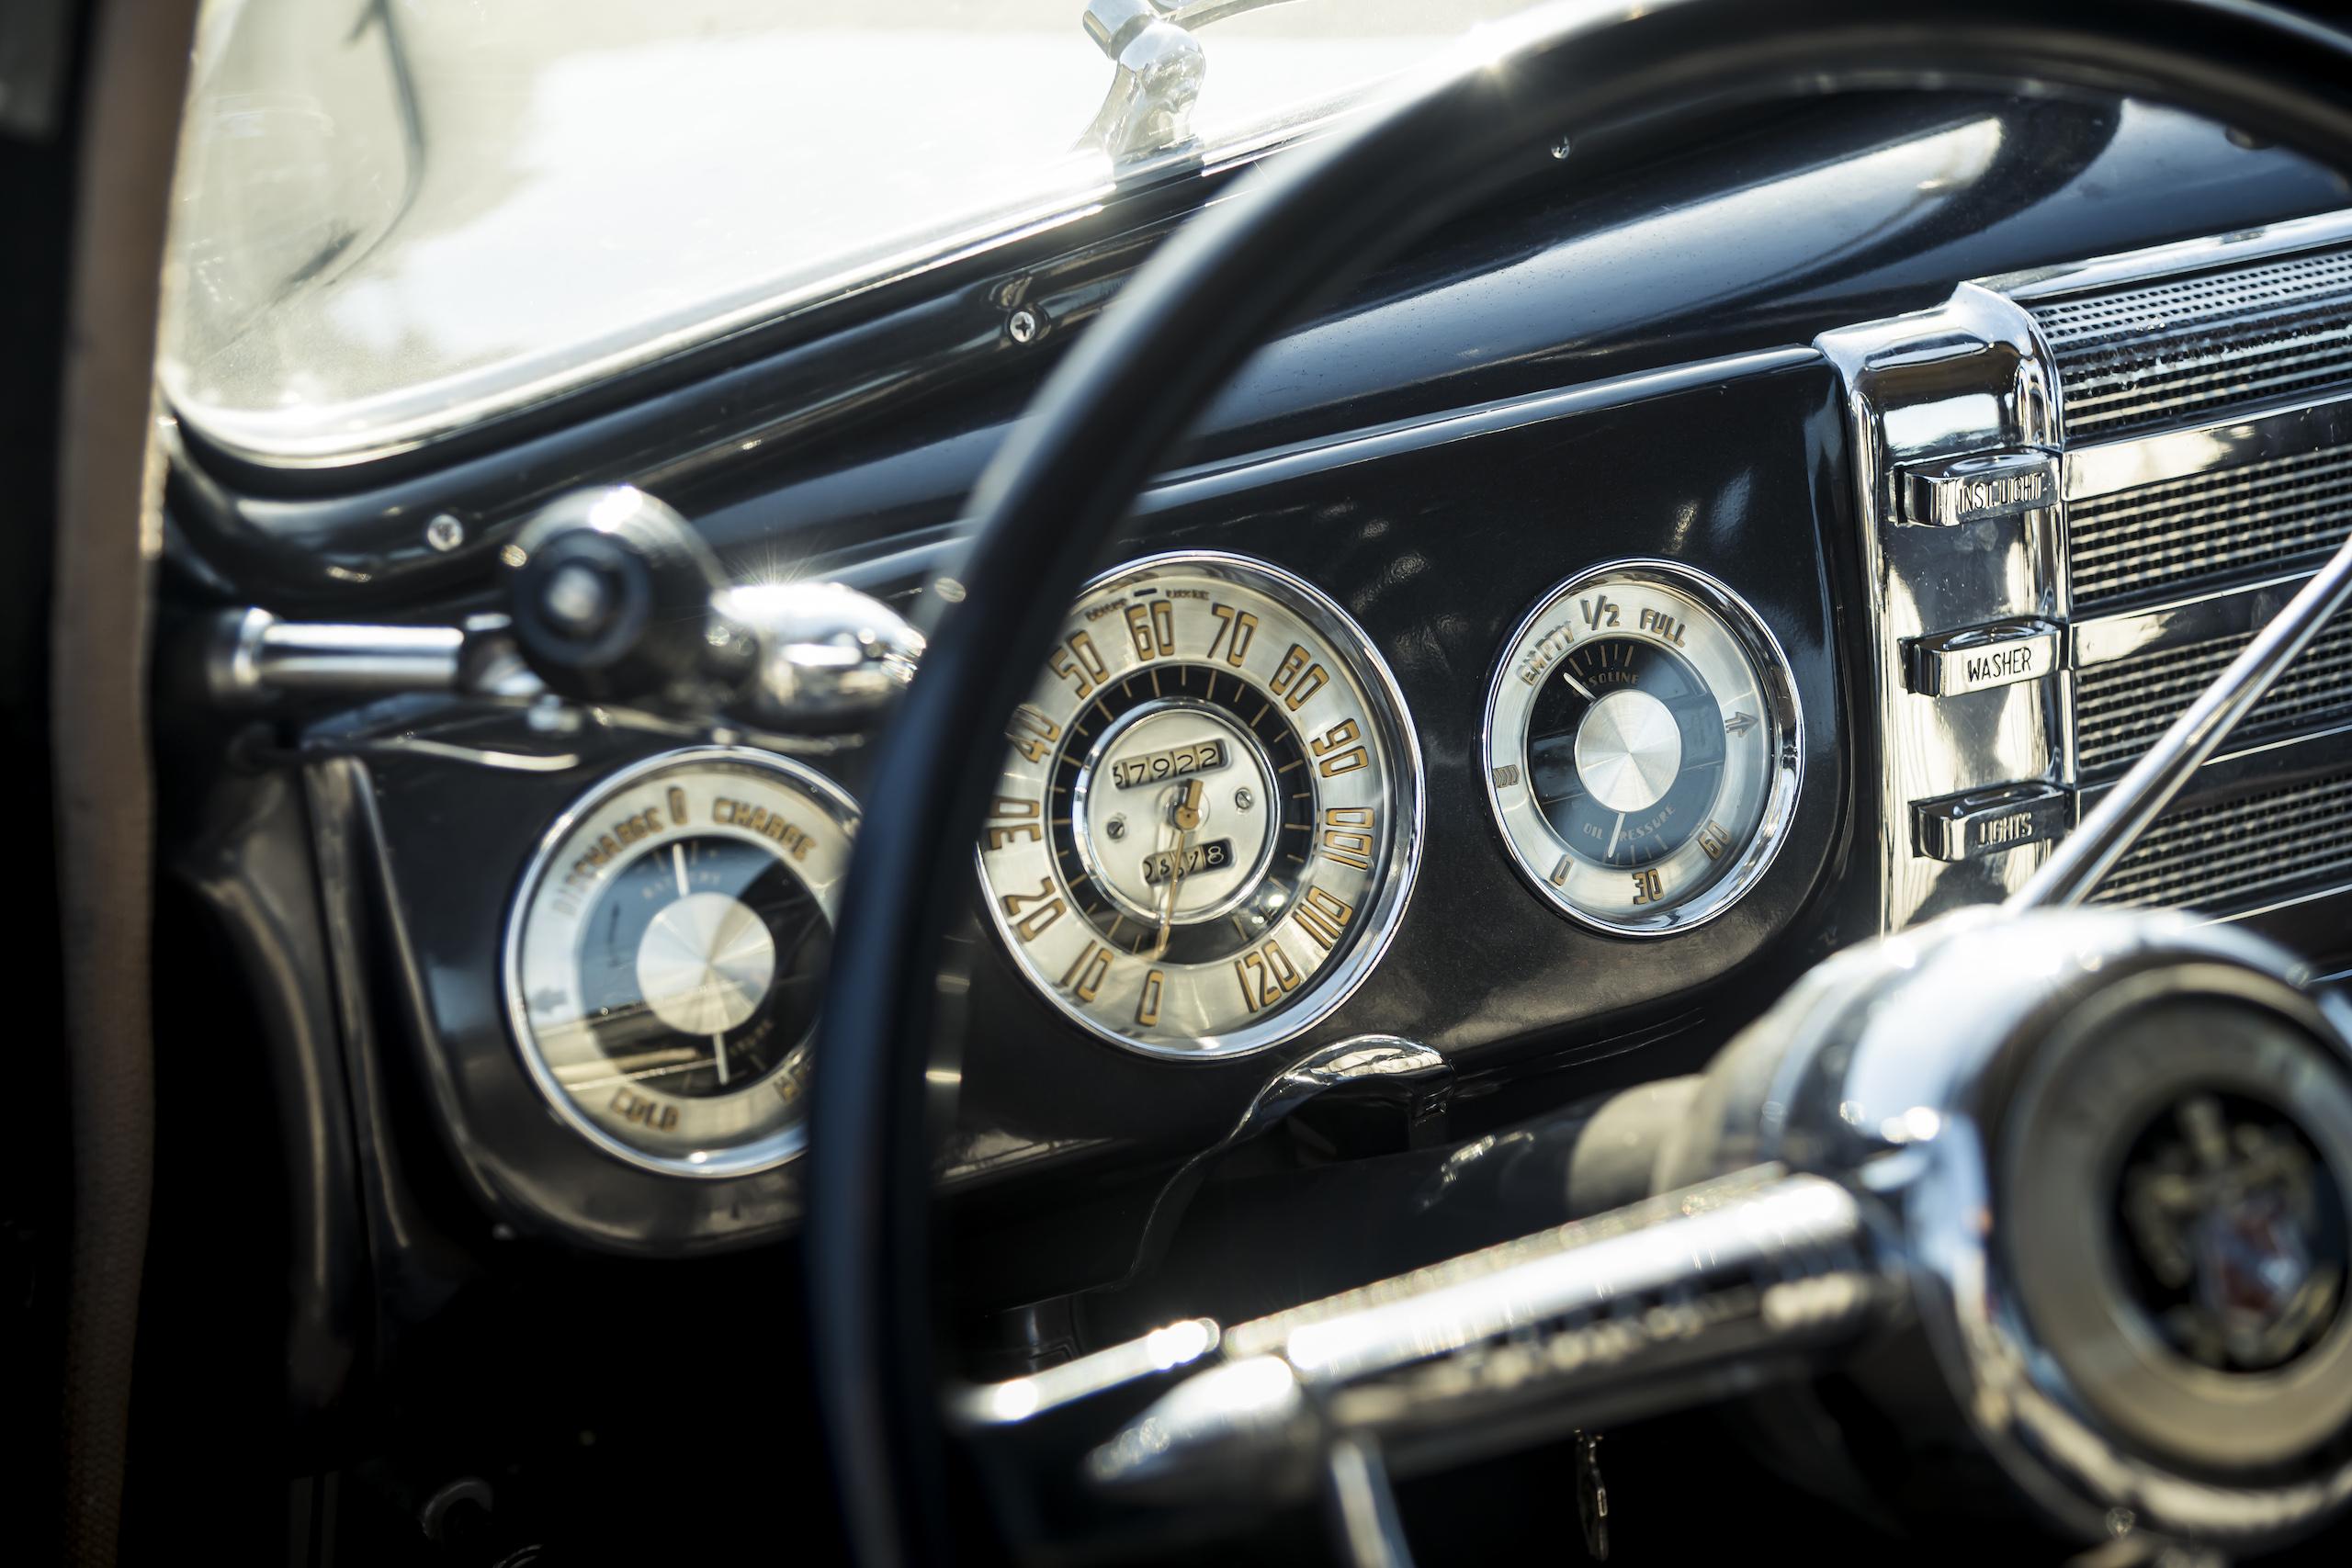 1946 Buick Special interior dash